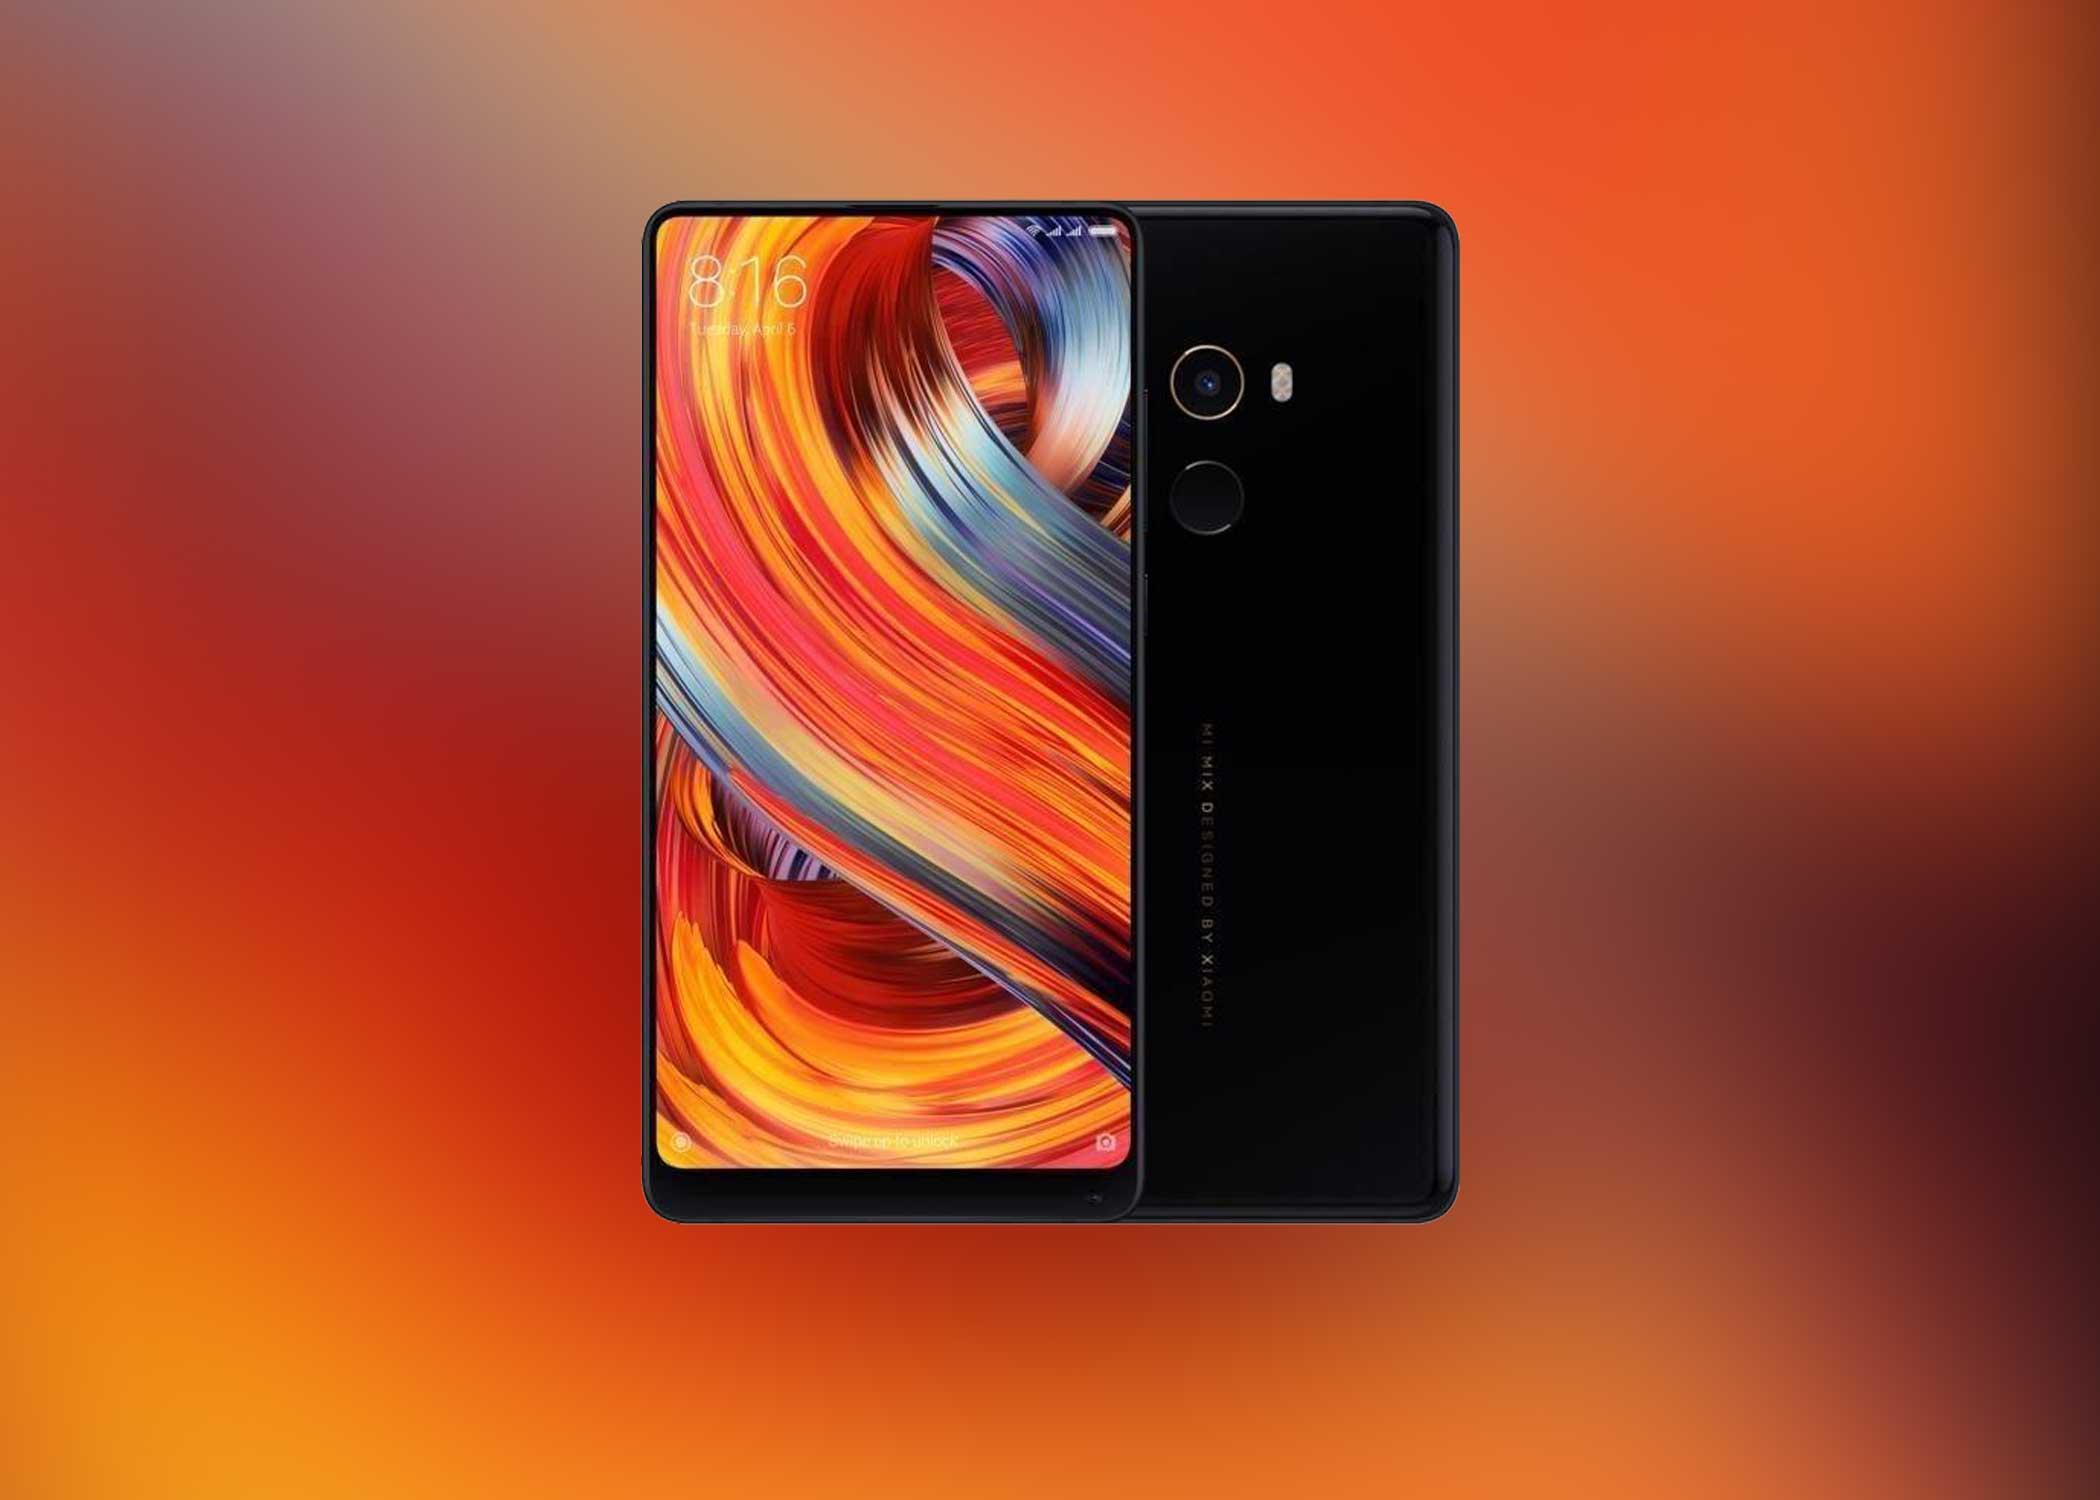 🔥 Bon Plan : le Xiaomi Mi Mix 2 à 229 euros chez Cdiscount via ODR